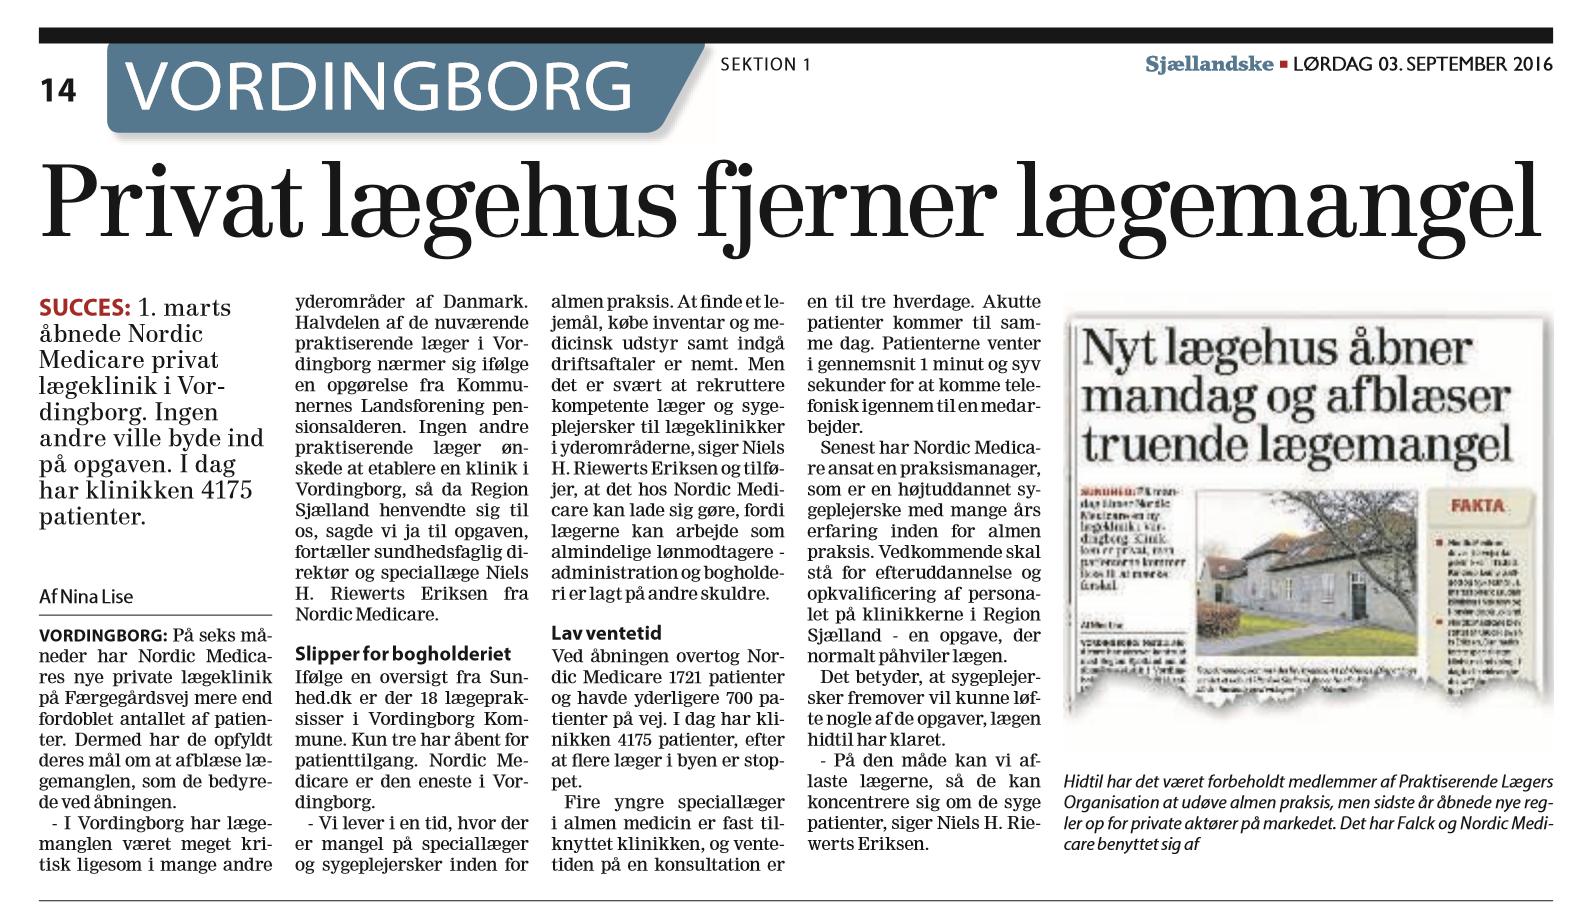 nordic-medicare-laegeklinik-vordingborg-endnu-en-succeshistorie